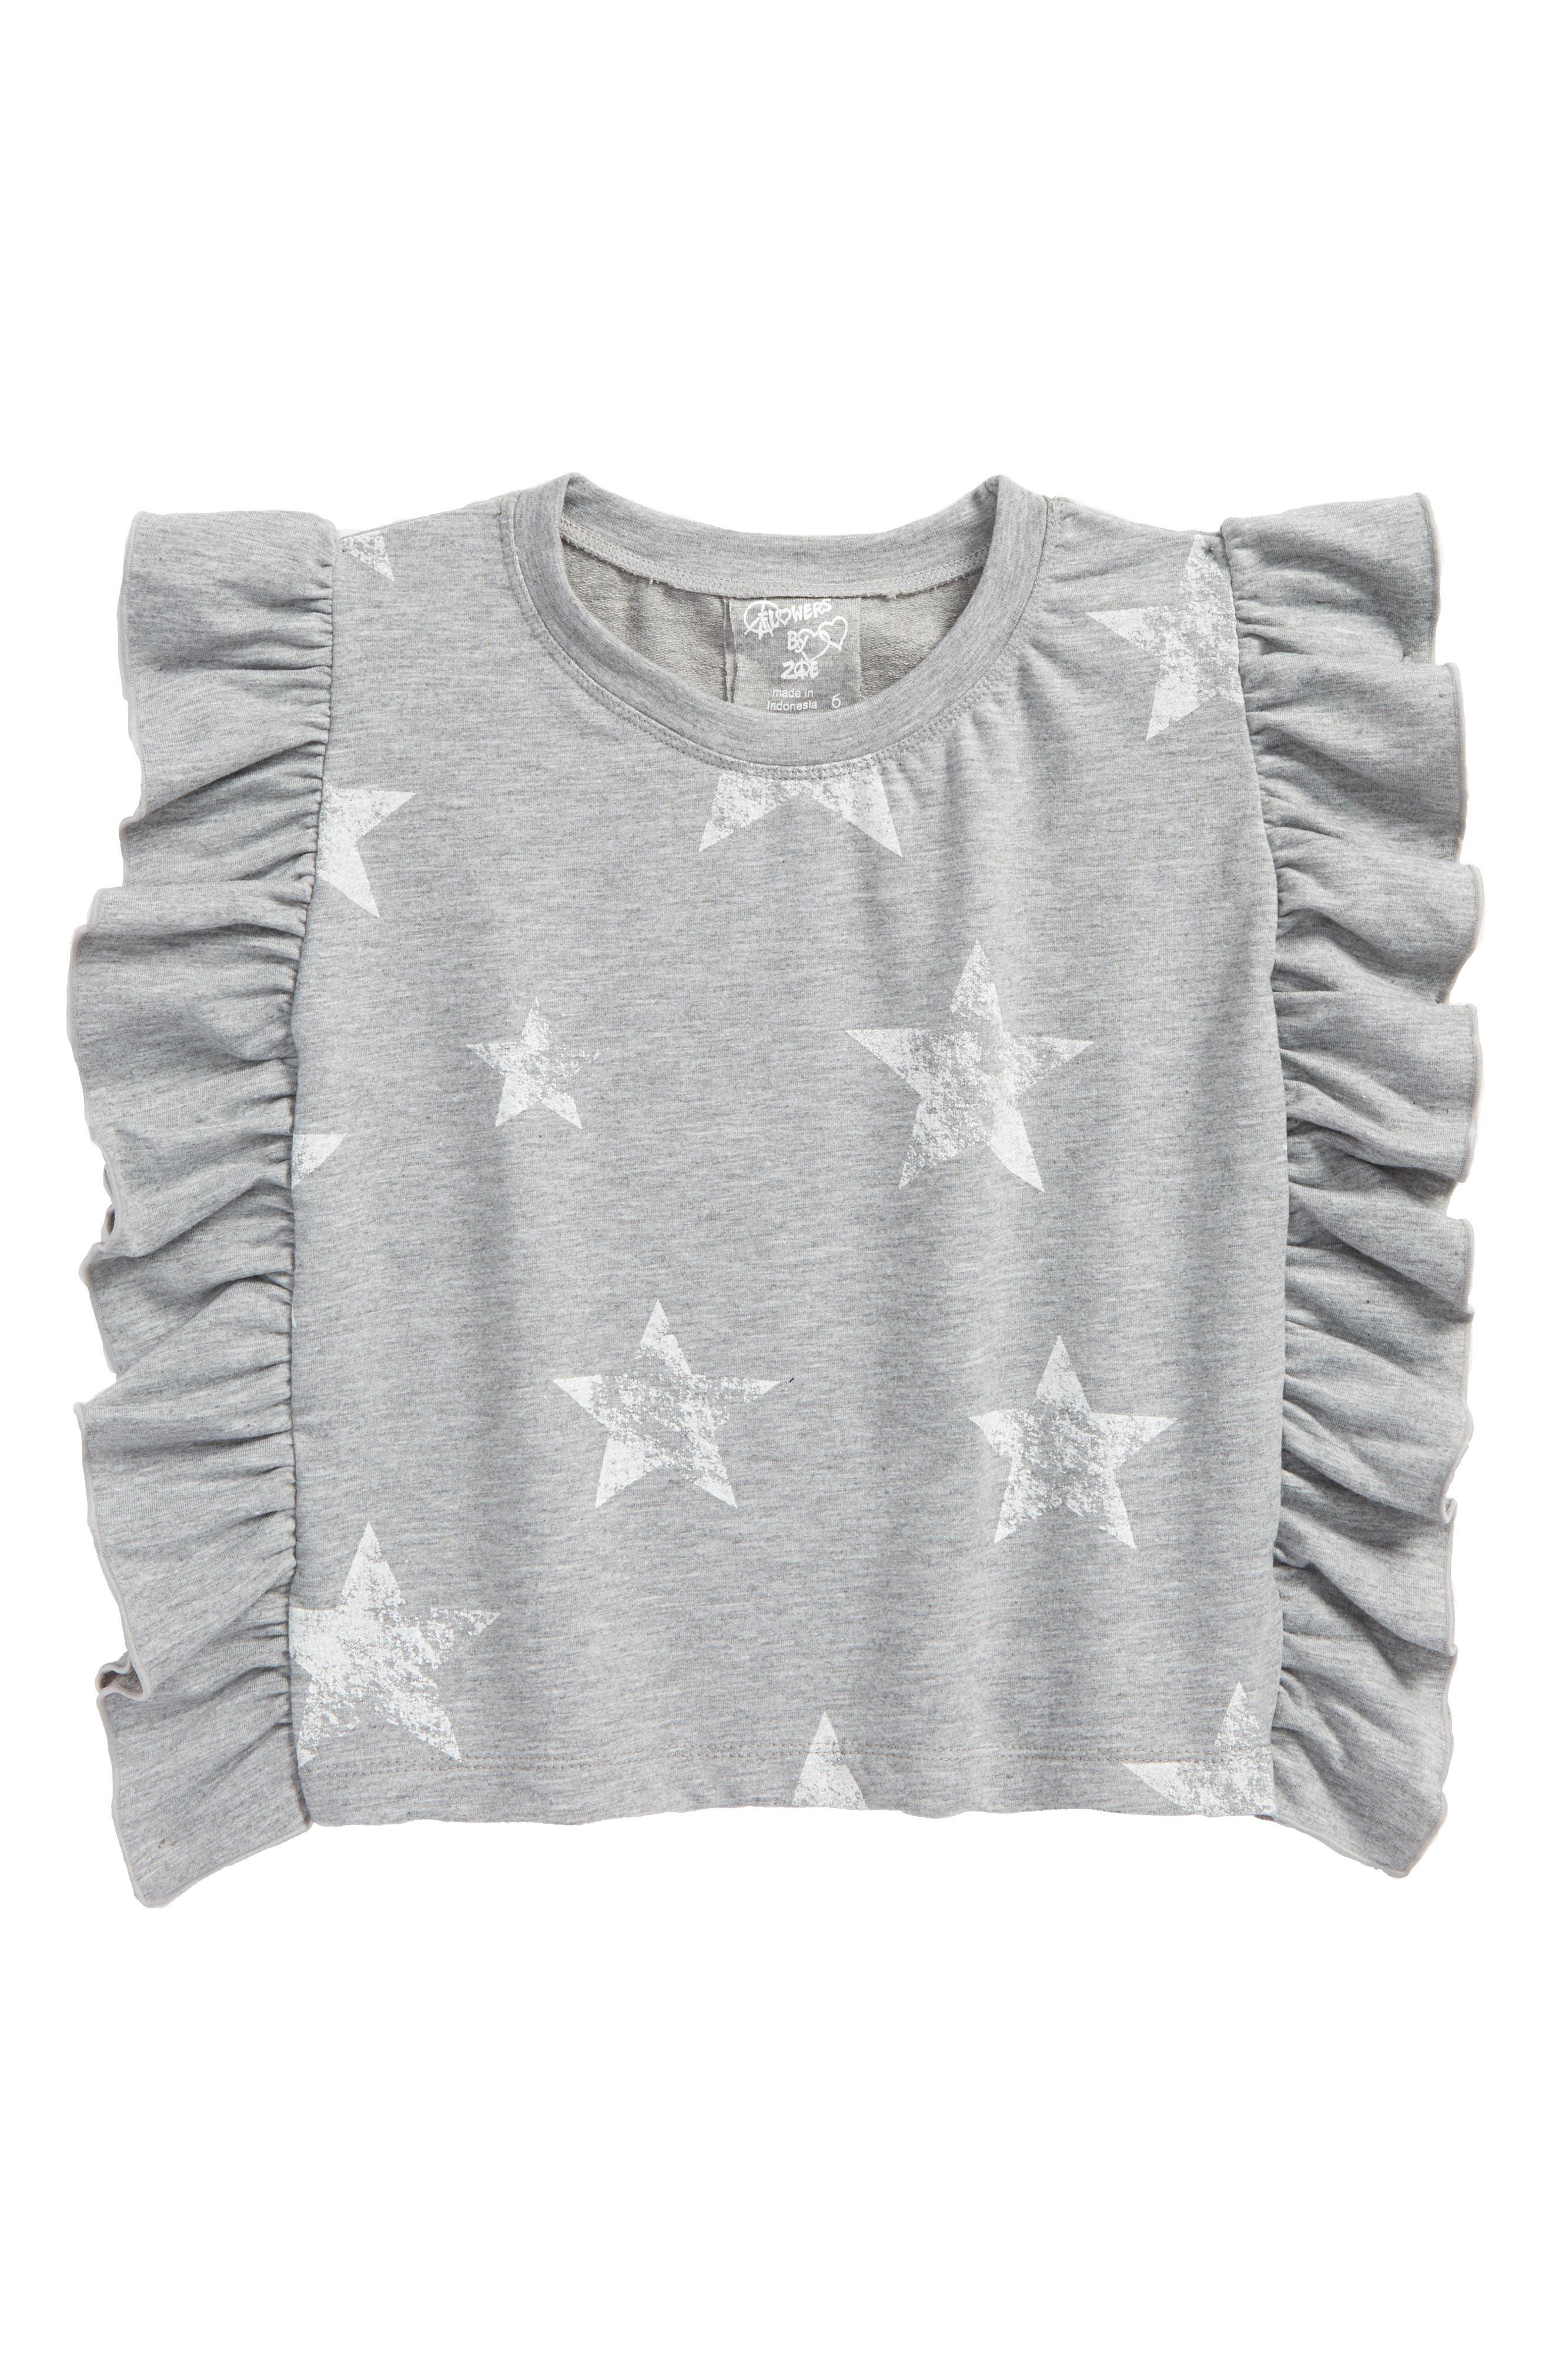 Alternate Image 1 Selected - Flowers by Zoe Star Print Ruffle Side Sweatshirt (Big Girls)